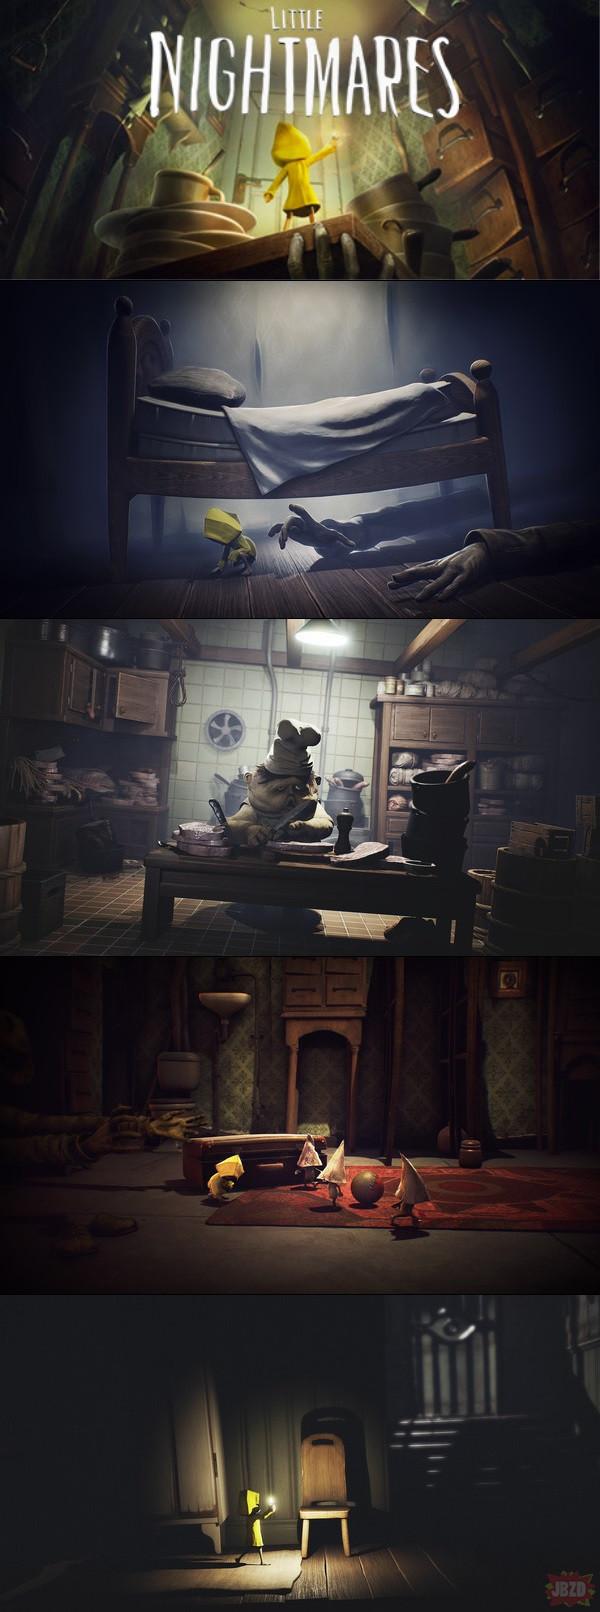 Little Nightmares na PC (steam) za darmo w sklepie Bandai Namco